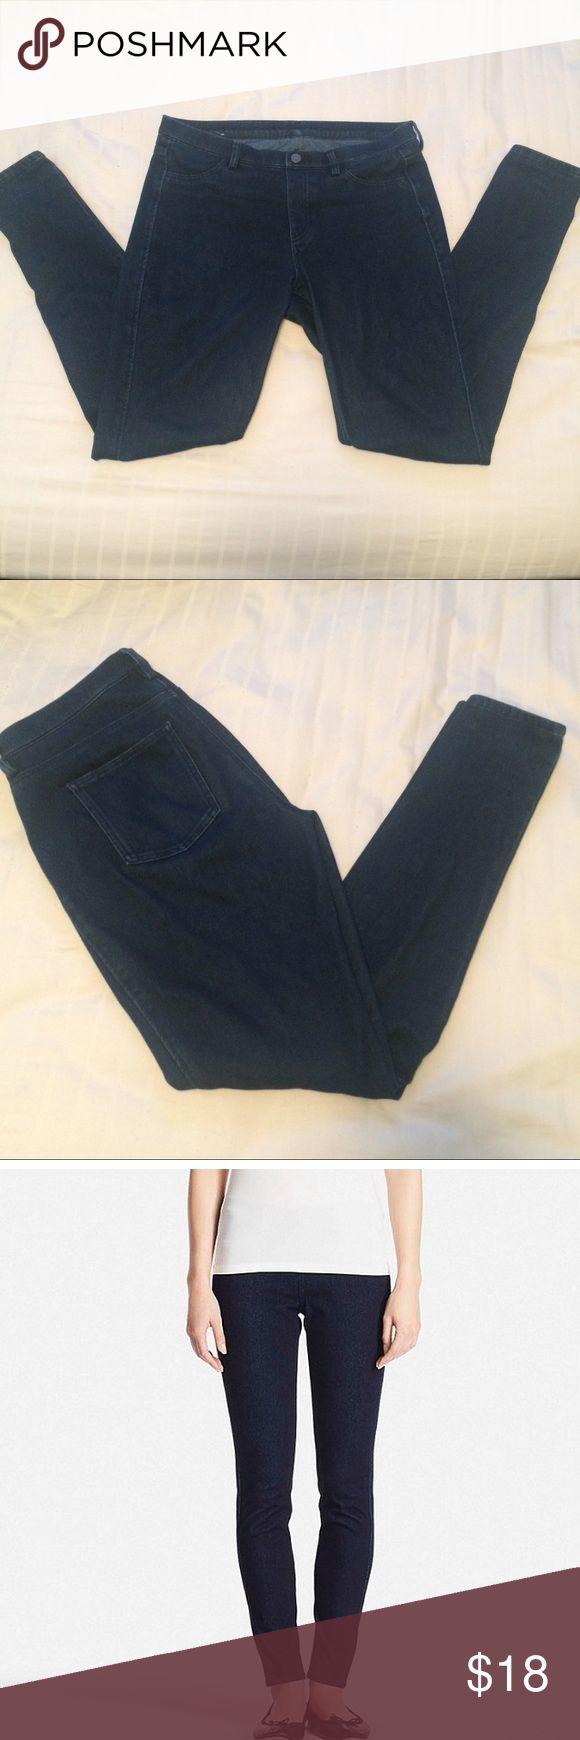 Selling this REDUCED Uniqlo denim legging pants on Poshmark! My username is: izzo055. #shopmycloset #poshmark #fashion #shopping #style #forsale #Uniqlo #Pants